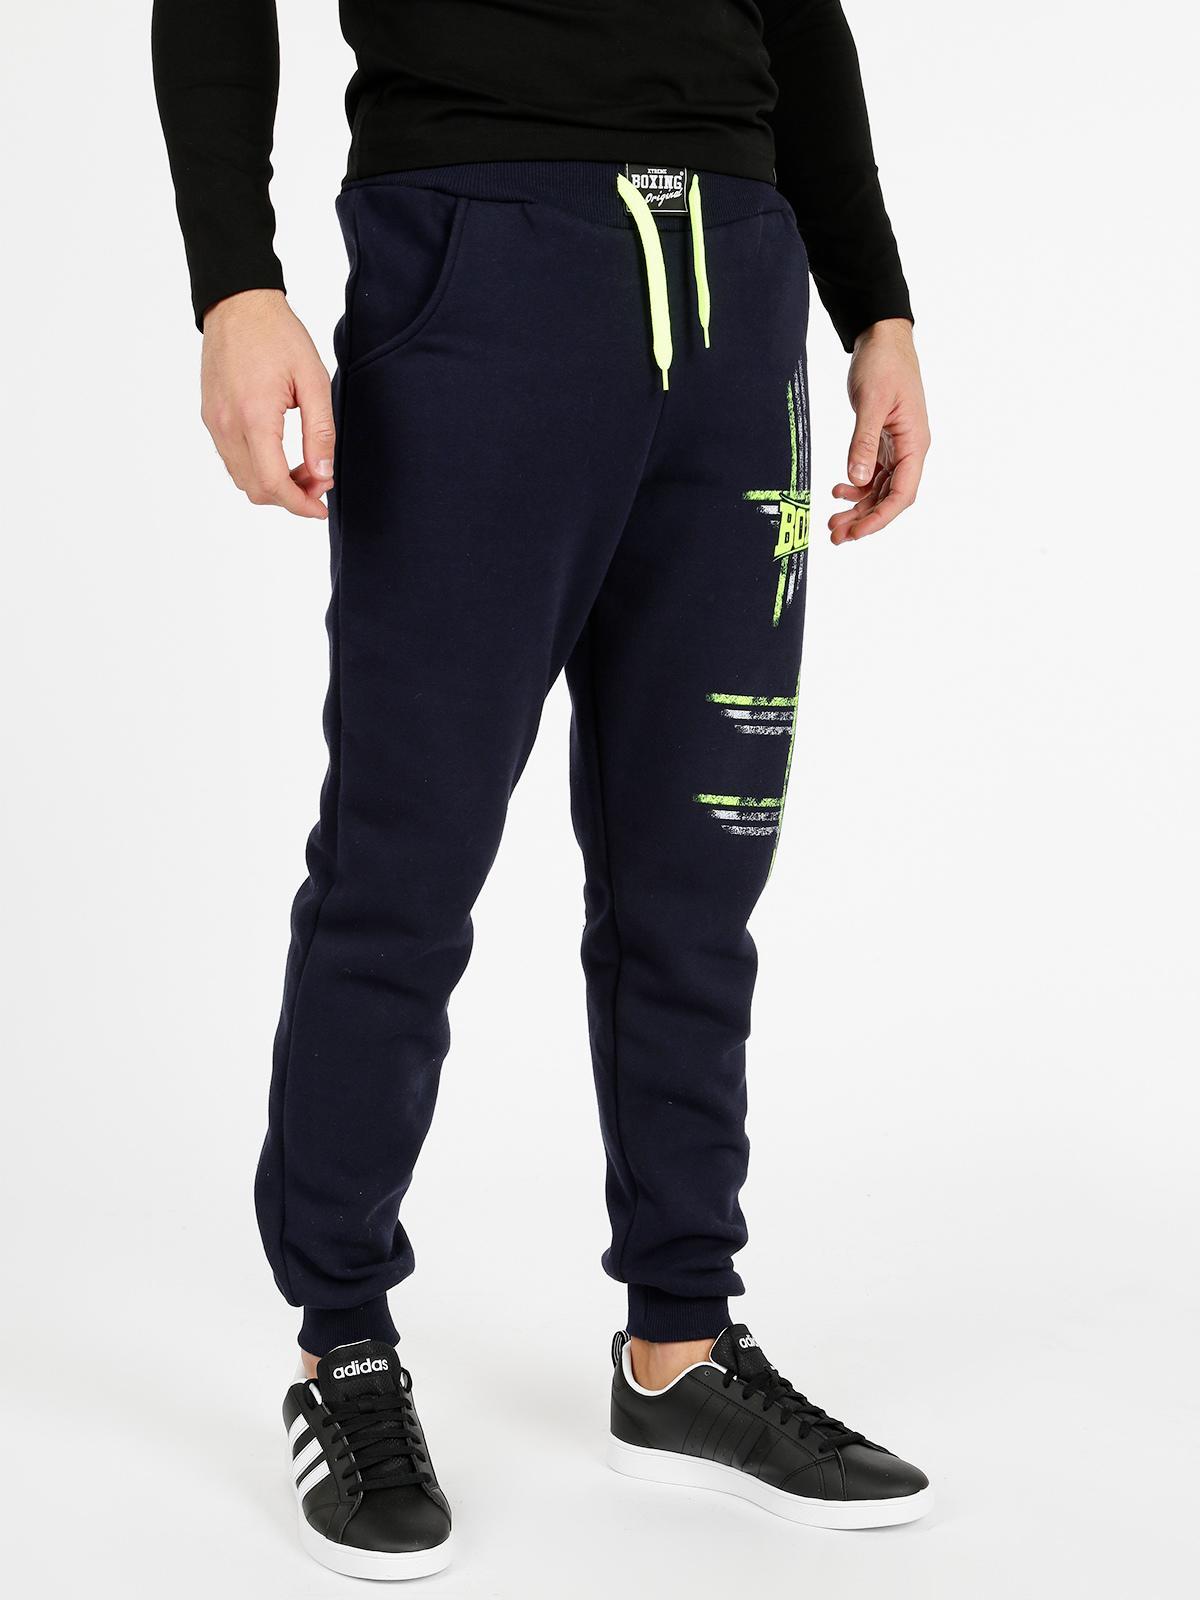 pantaloni adidas uomo con polsino